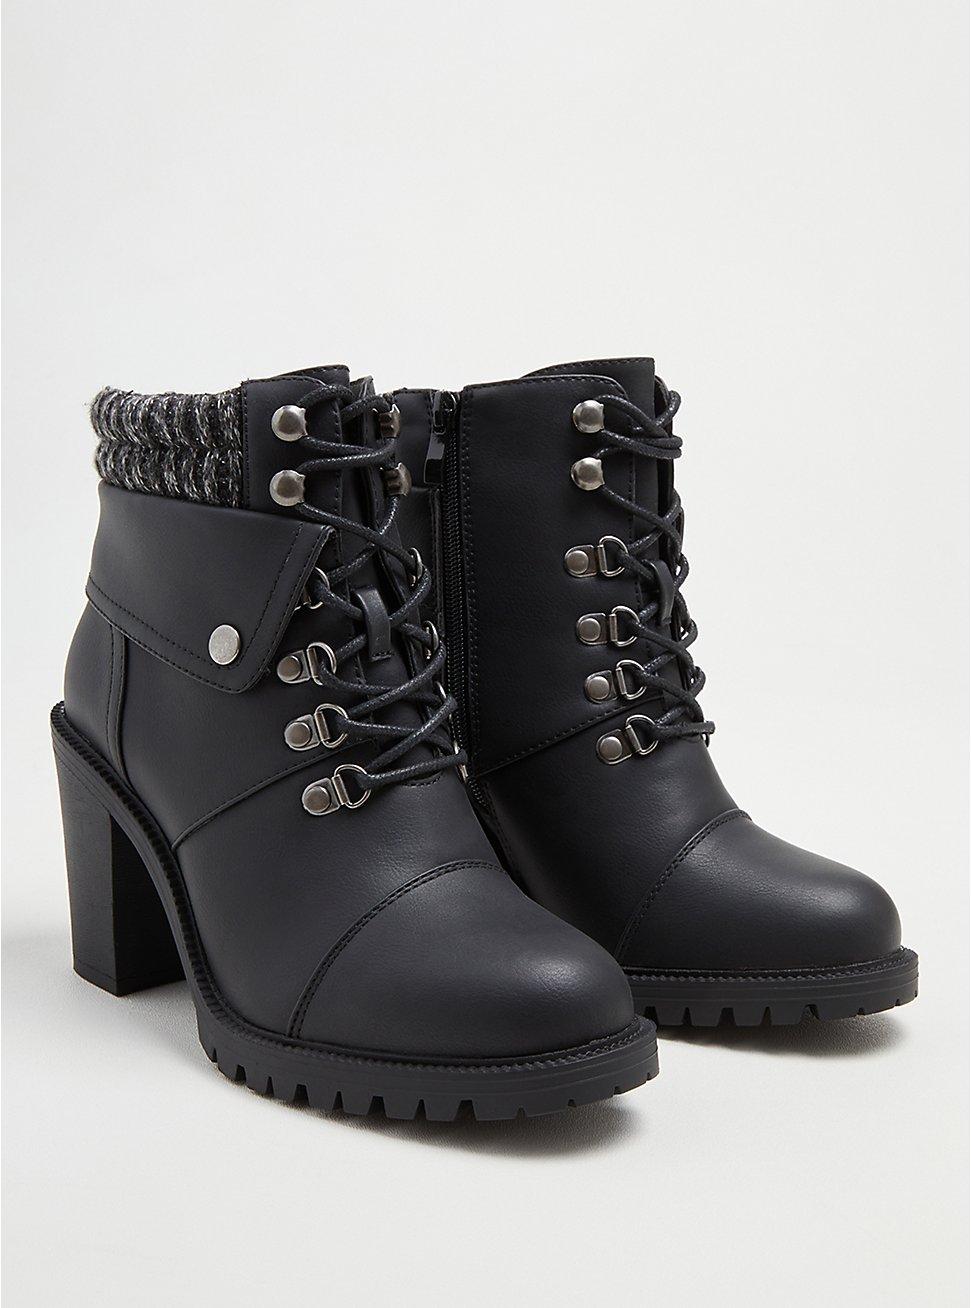 Plus Size Sweater Hiker Boot - Black Faux Leather (WW), BLACK, hi-res